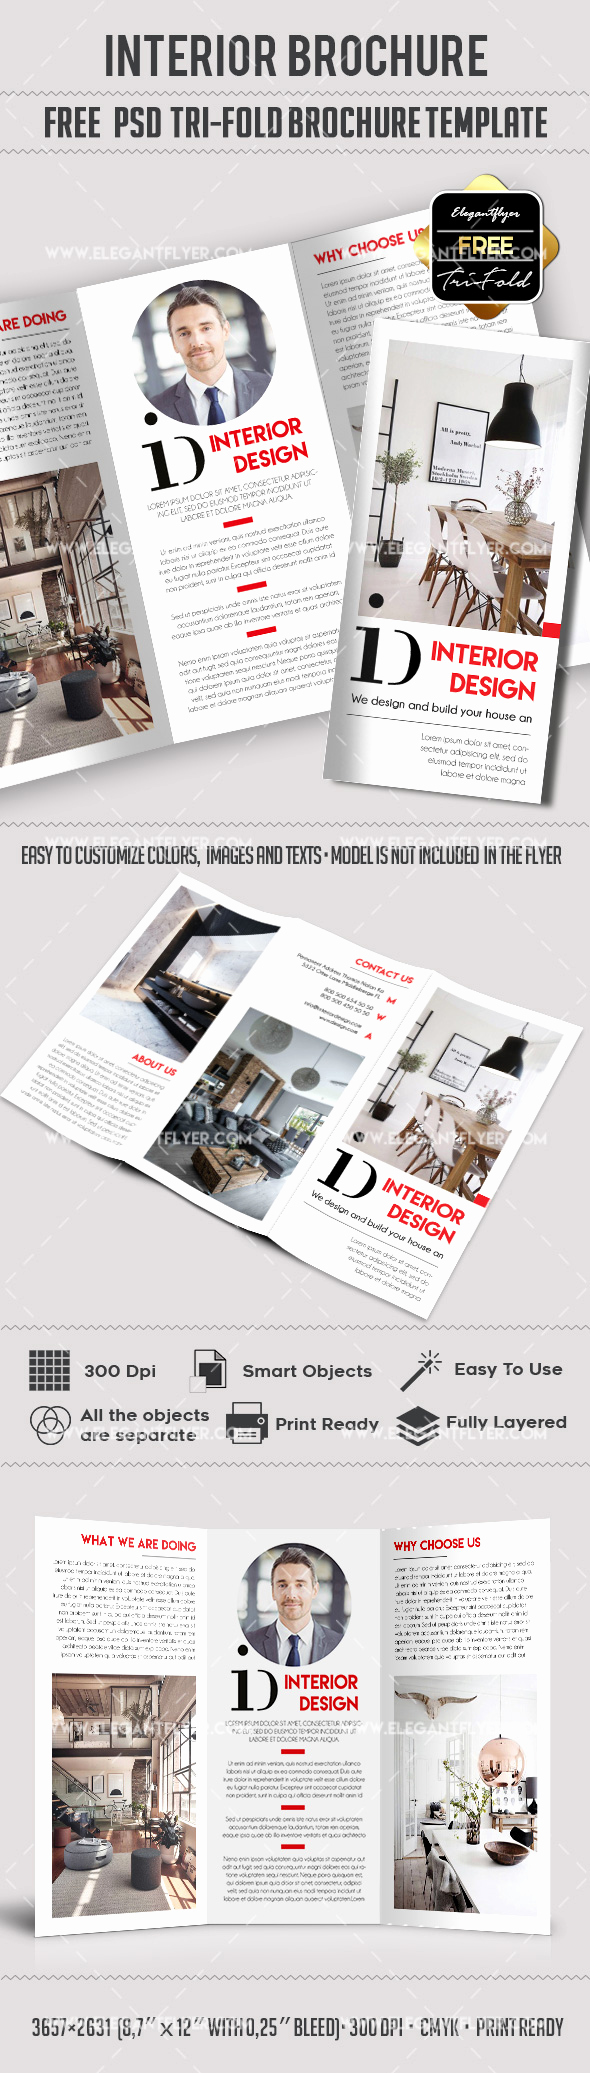 Tri Fold Brochure Template Psd Luxury Interior Design Free Tri Fold Brochure – by Elegantflyer